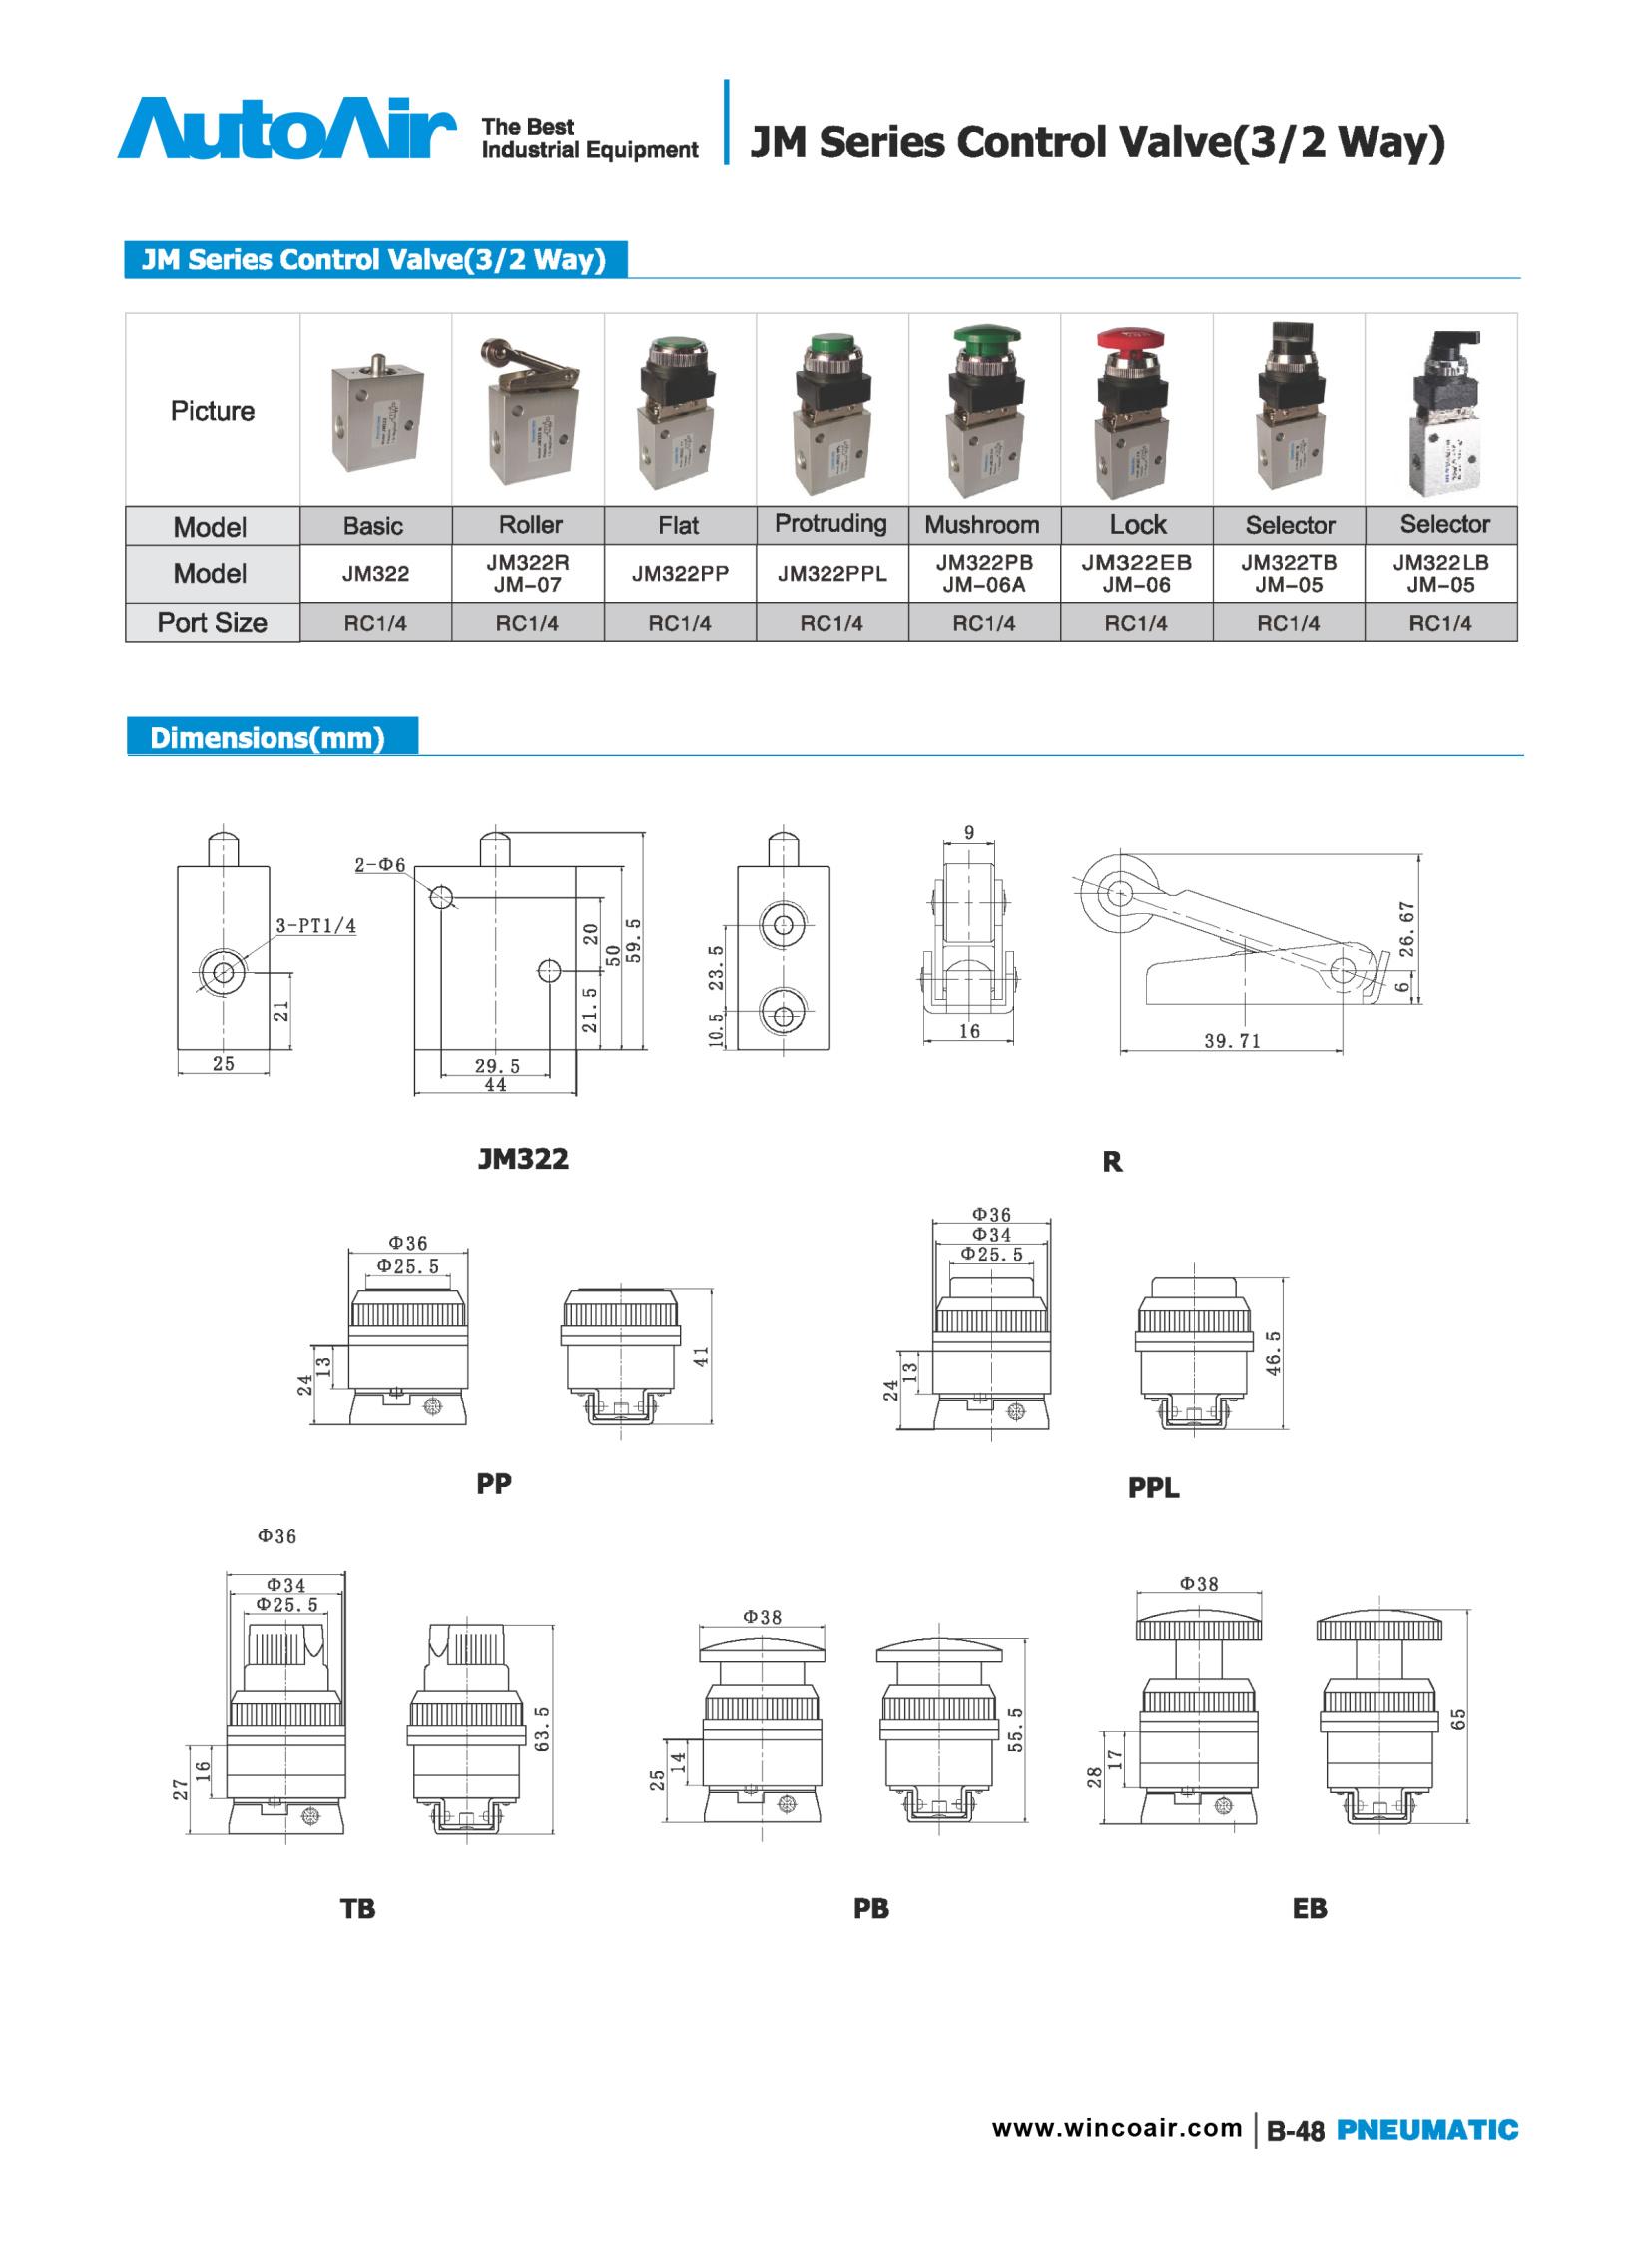 Solenoid valve(48)(1)